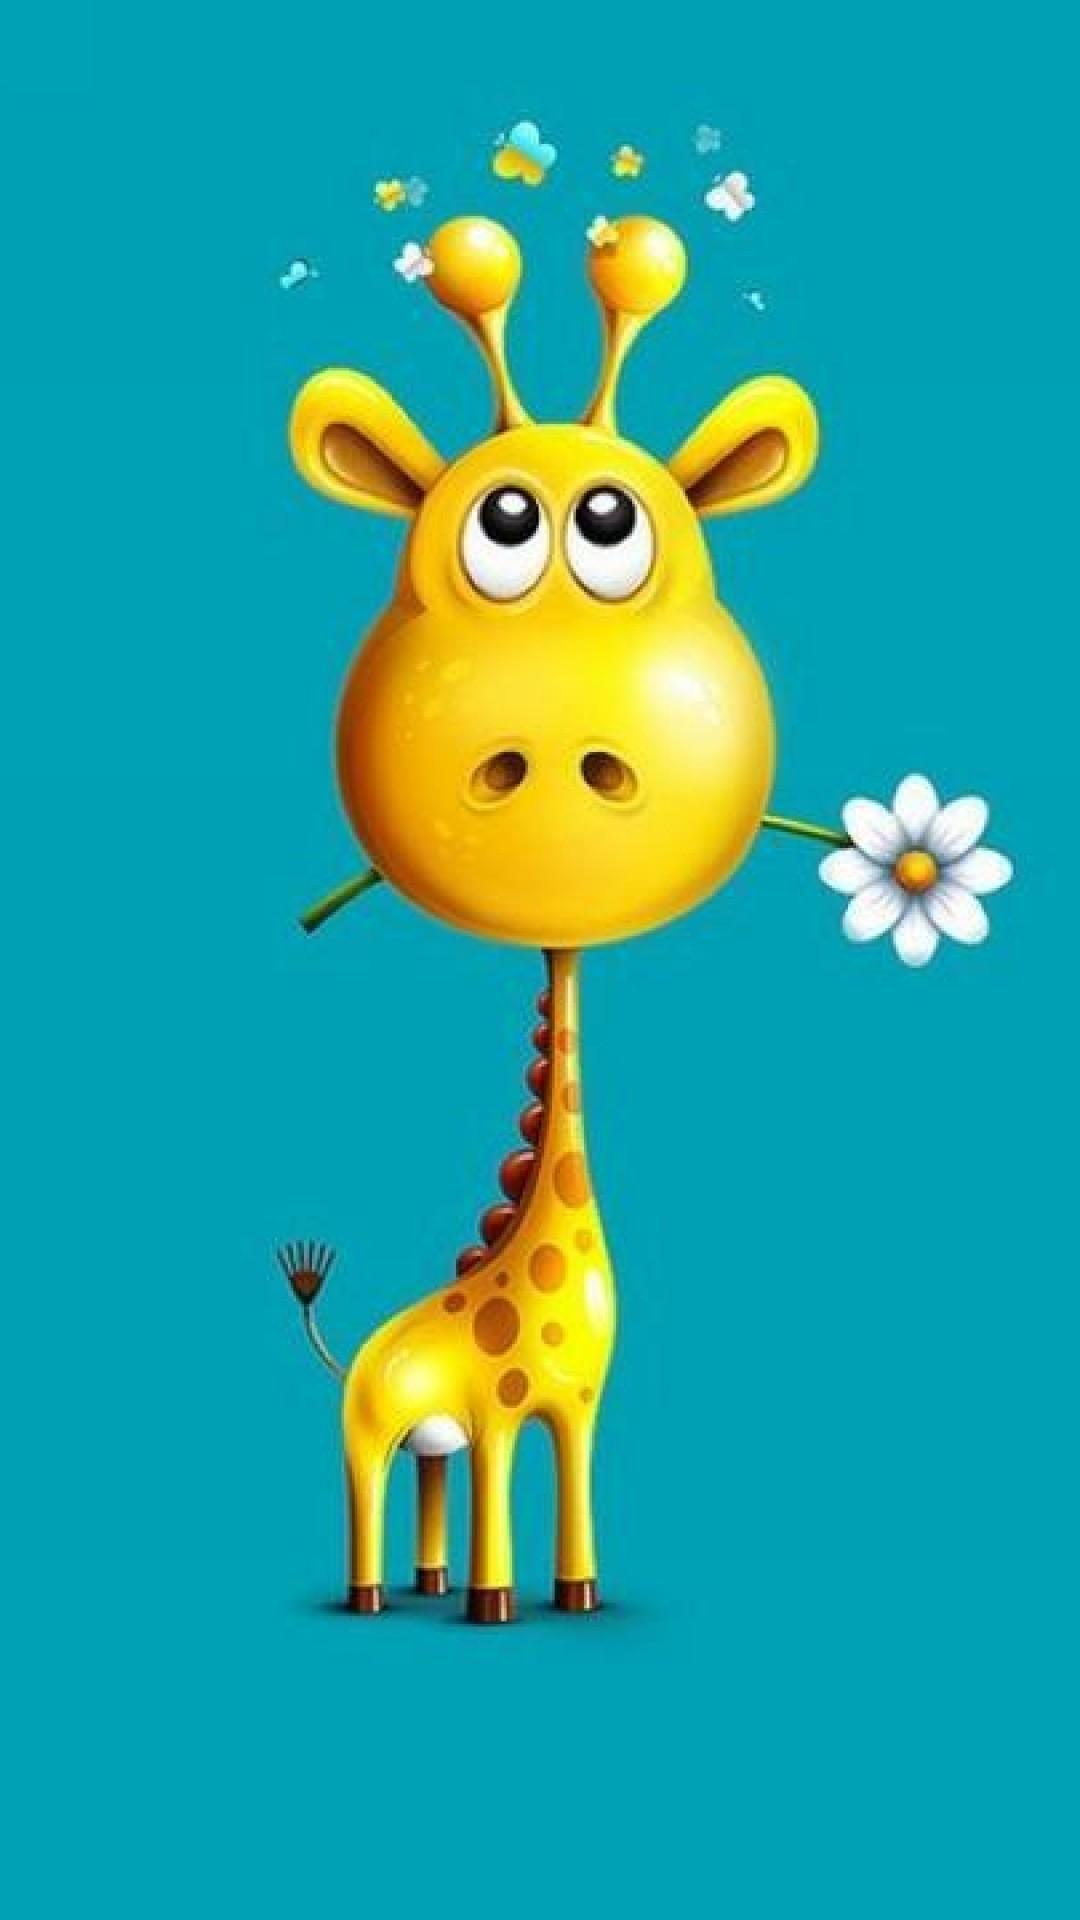 Explore Cute Giraffe, Giraffe Art, and more!